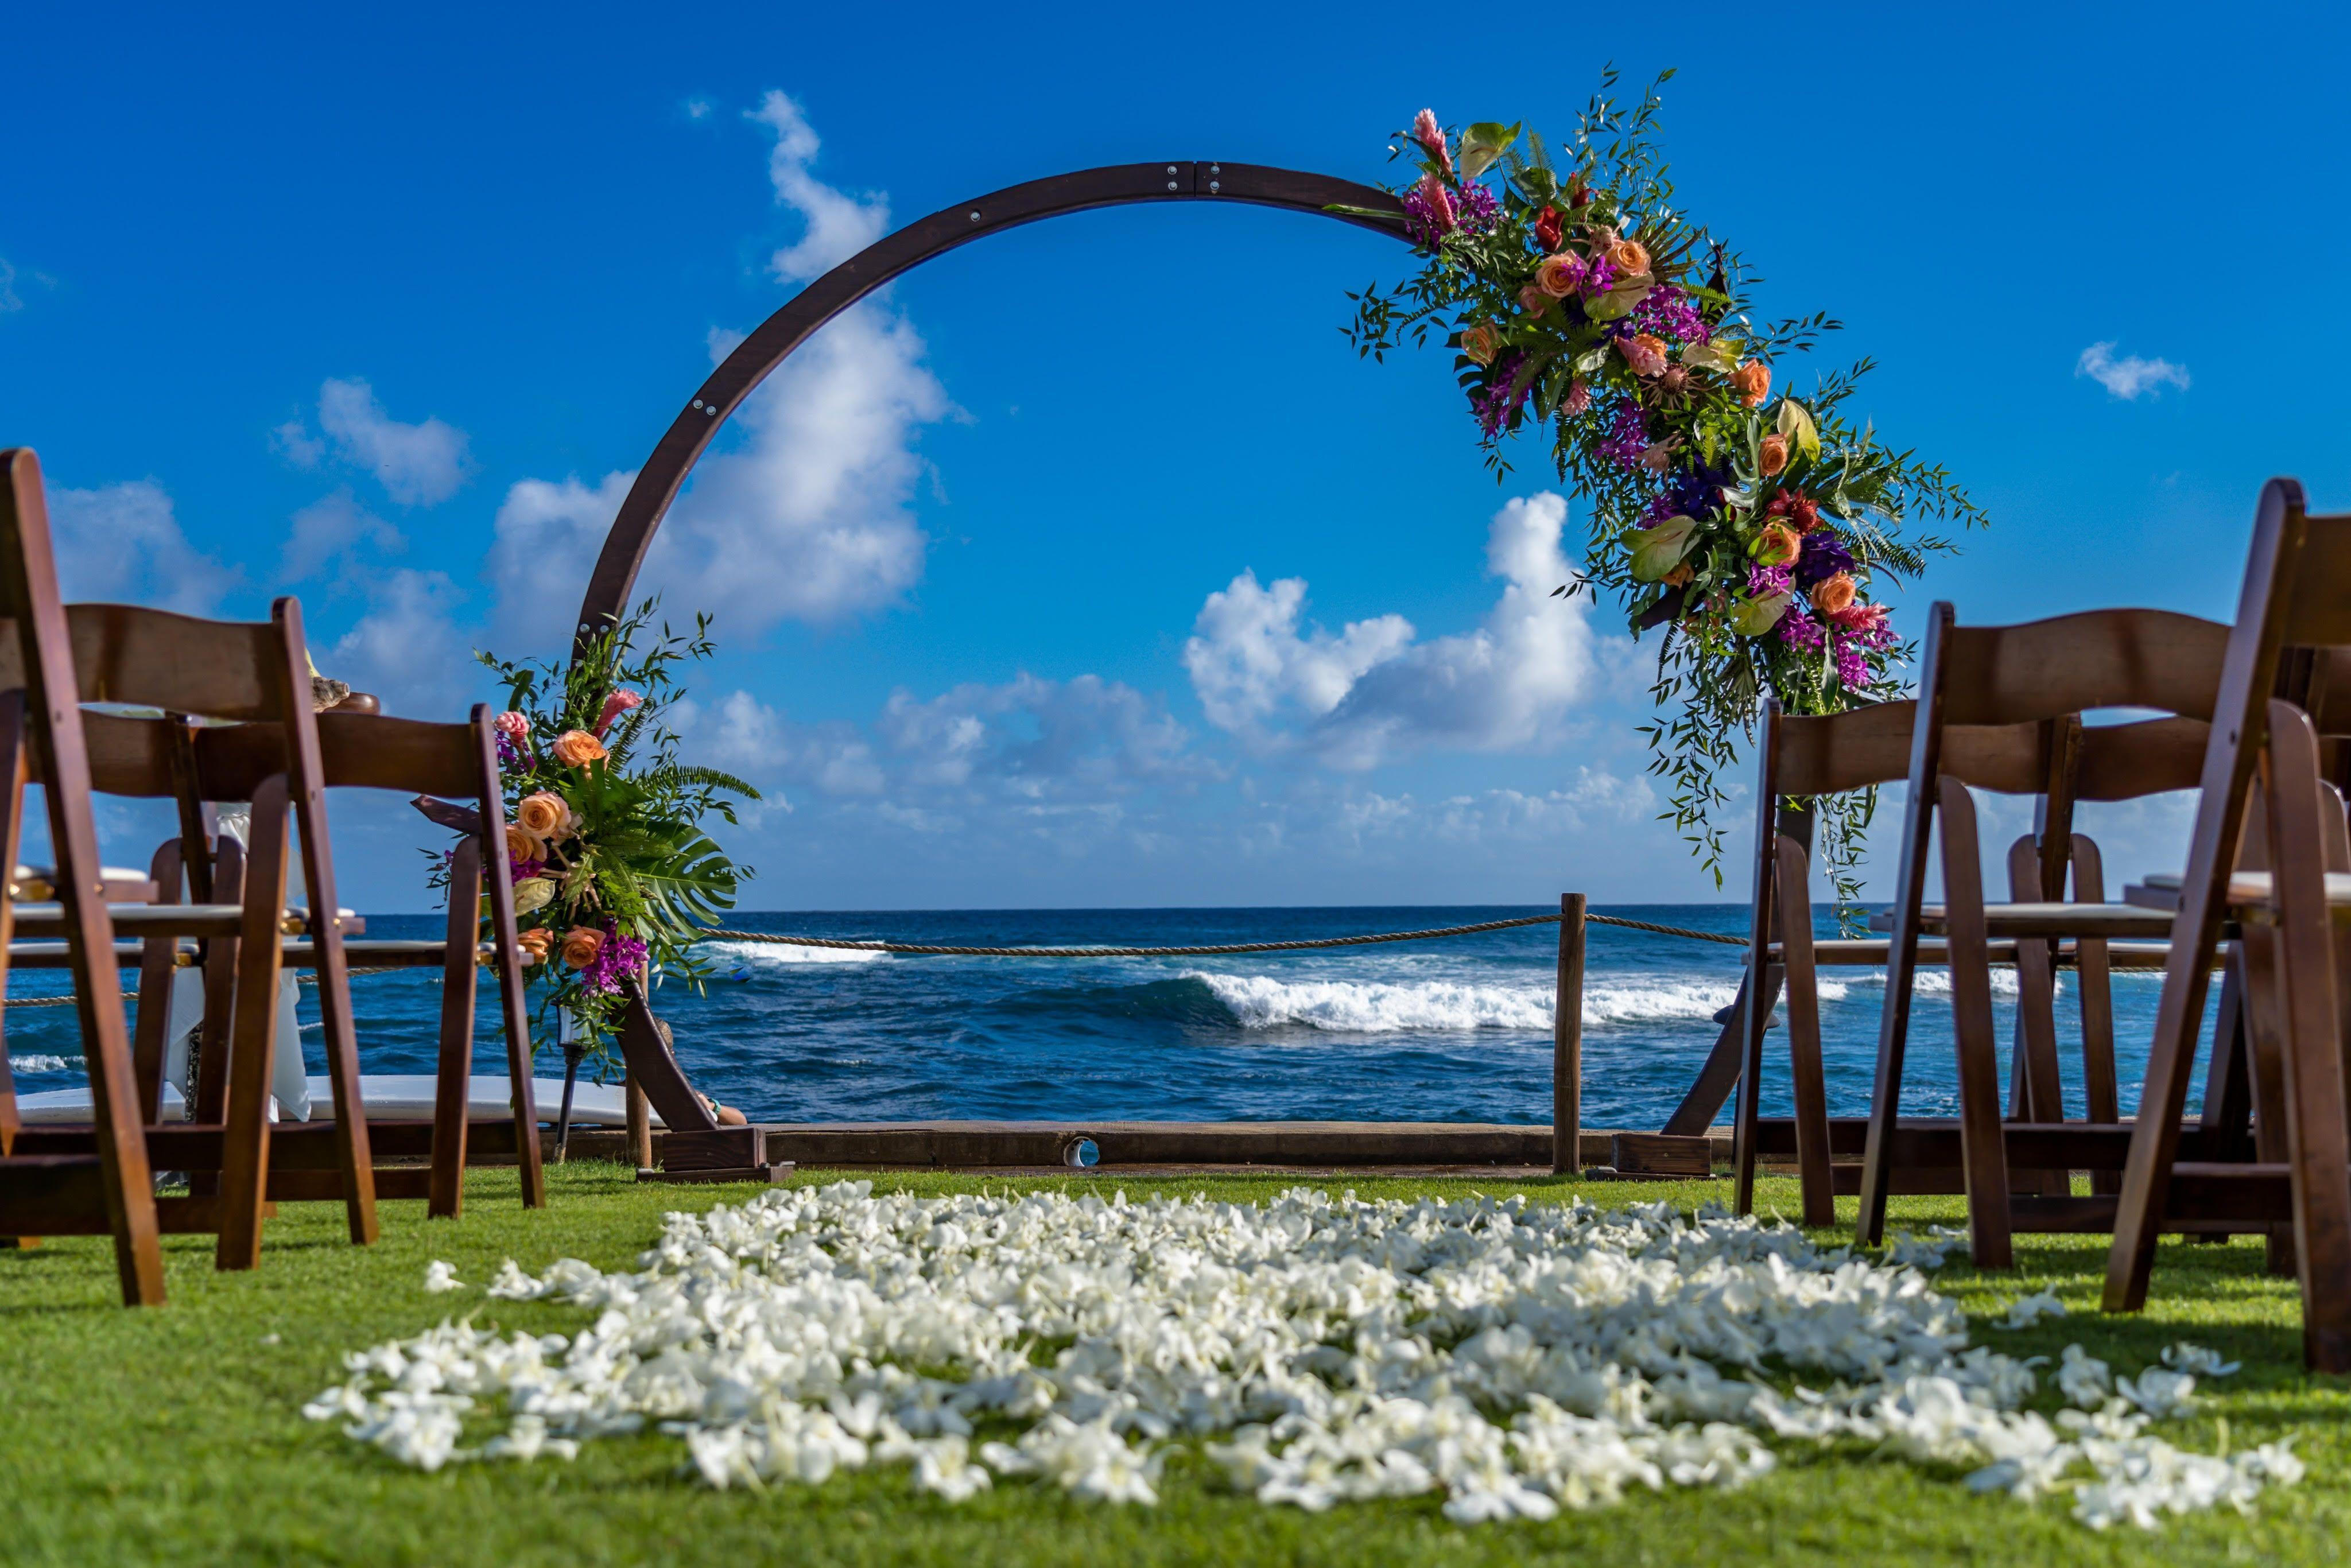 Vibrant Tropical Ceremony Oval Arch Oceanfront Kauai Destination Hawaii Wedding Oceanfront Wedding Hawaii Wedding Wedding Venues Beach